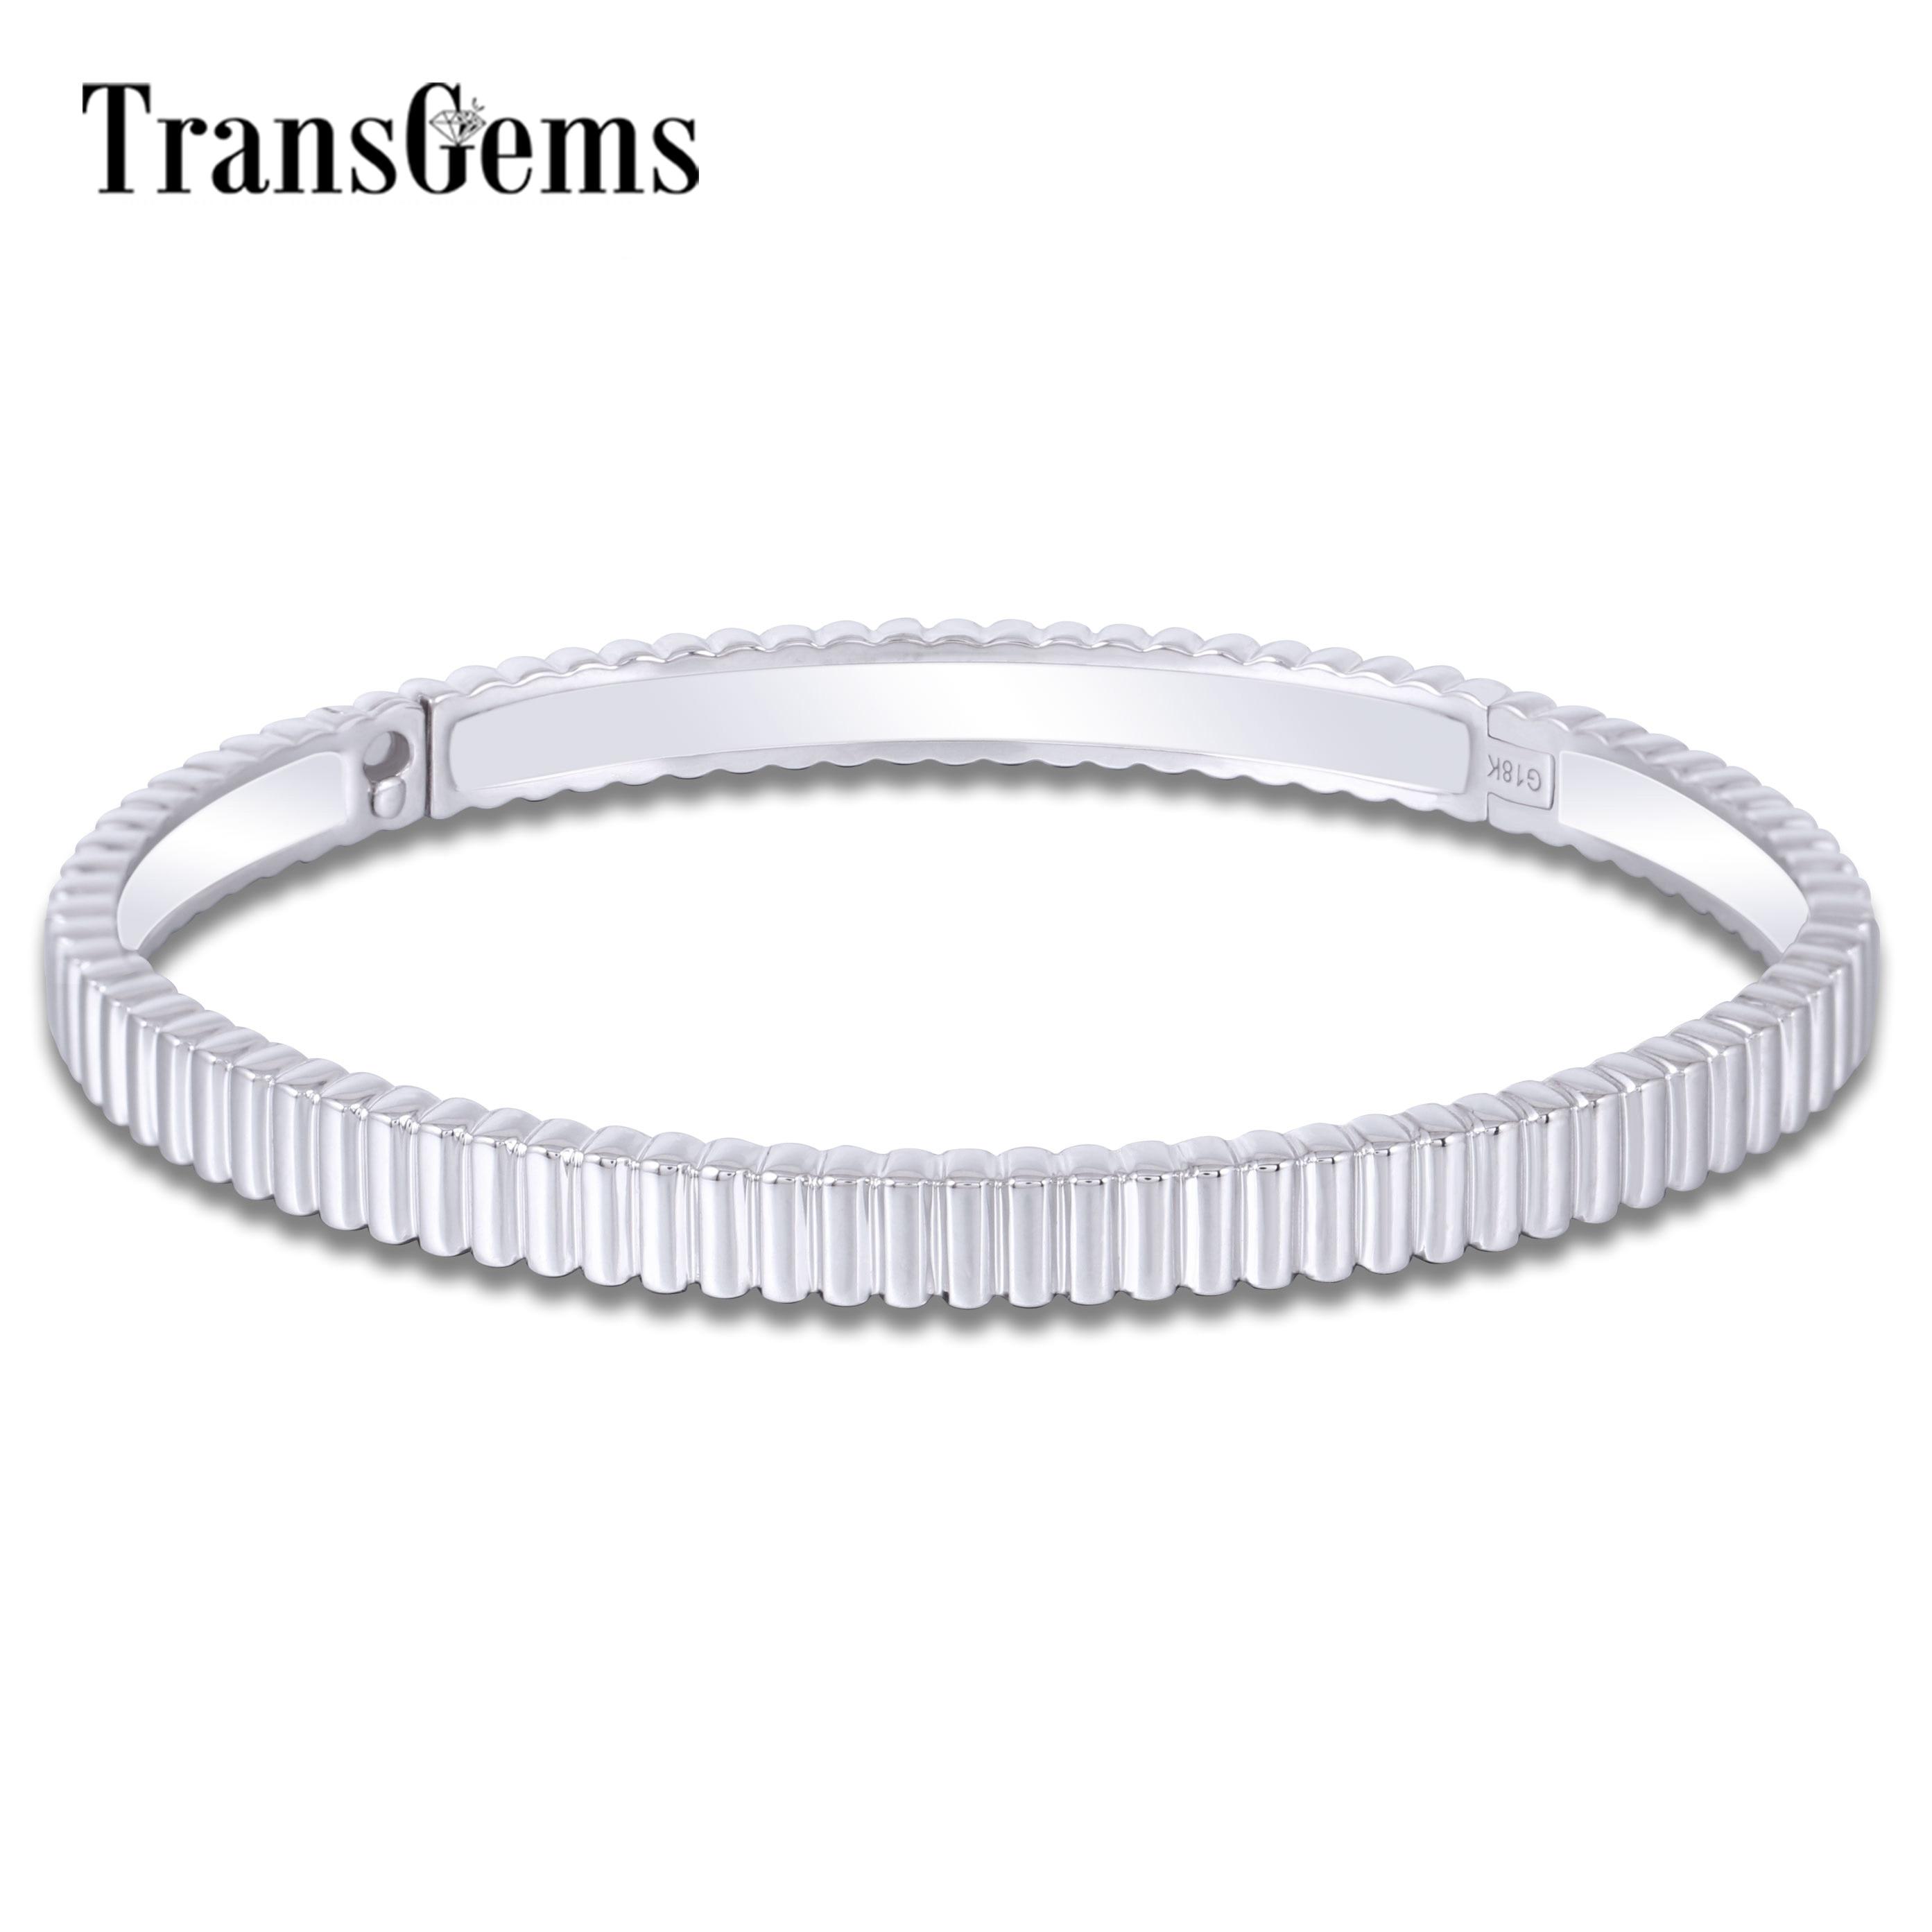 Transgems 18K 750 White Gold Wave Shape Bangle Bracelets for Women Size 16 Fine Jewelry Wedding